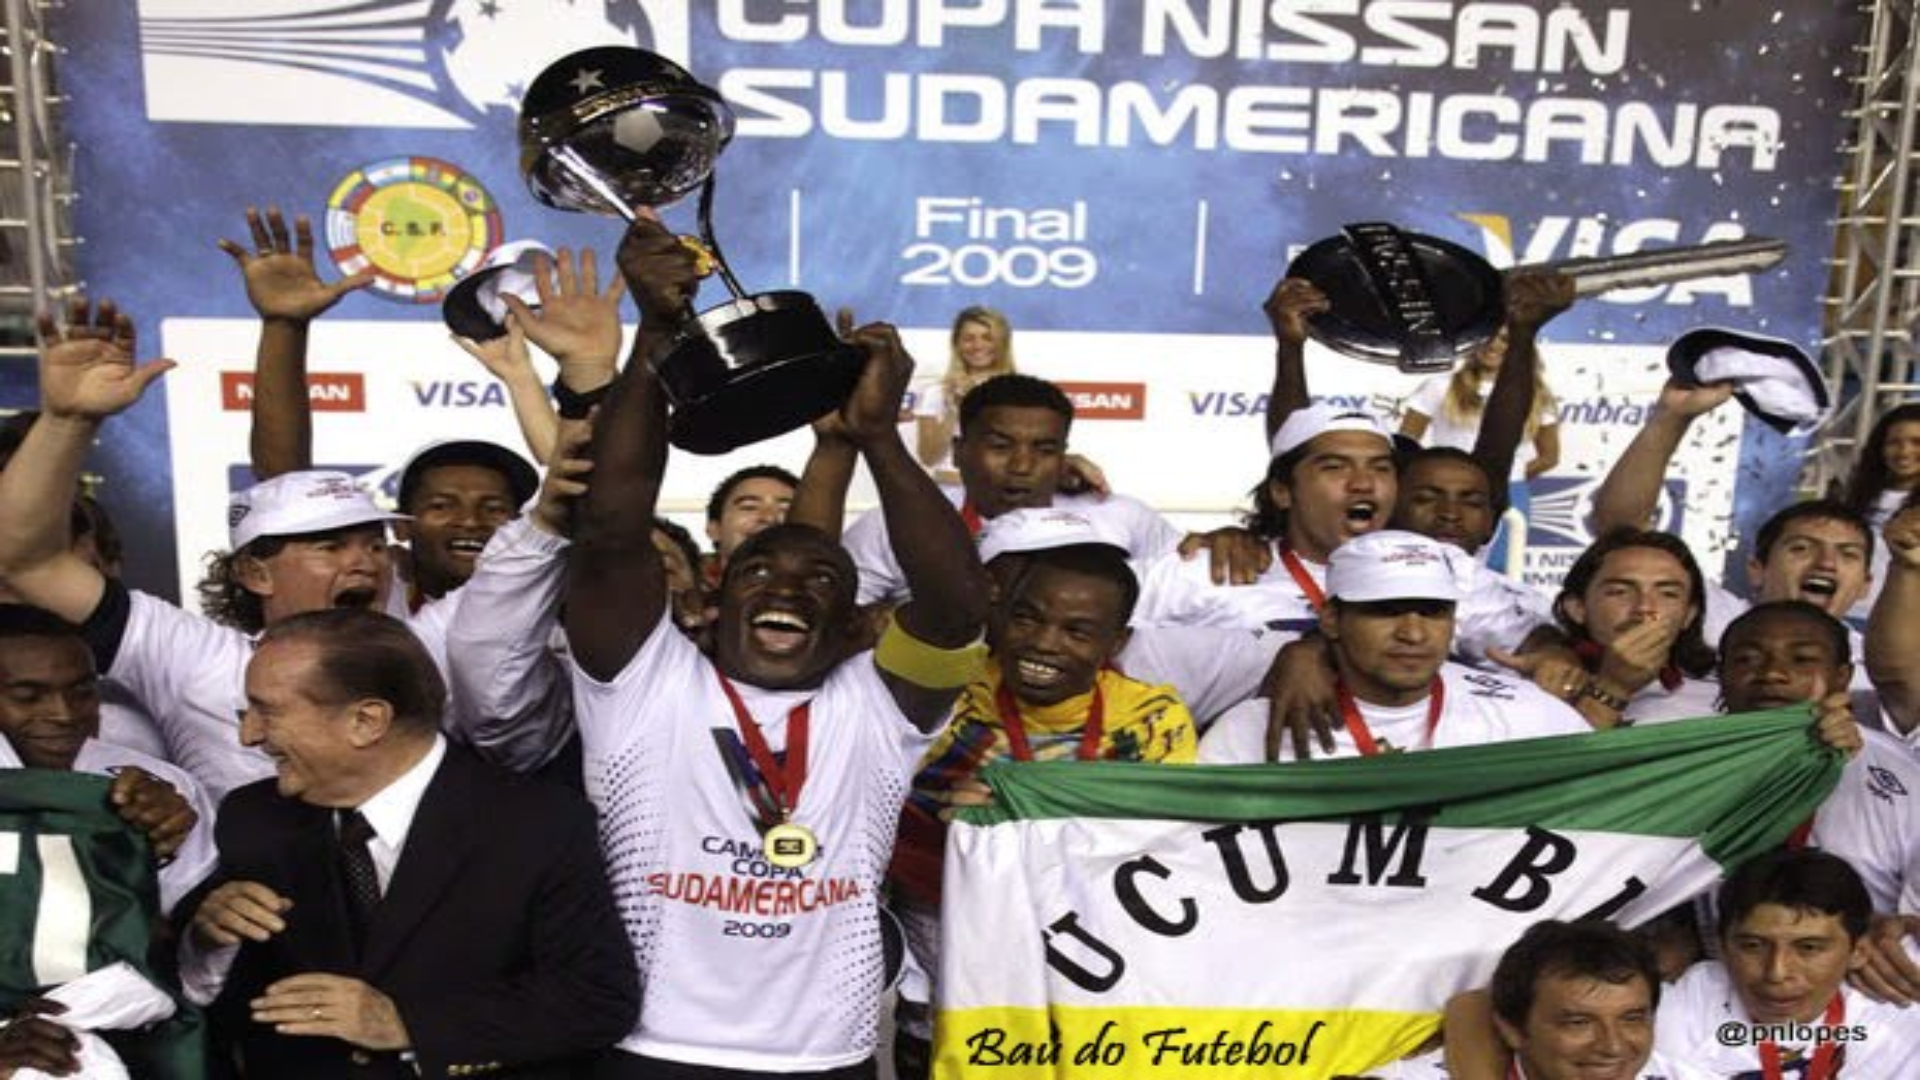 Fluminense LDU 2009